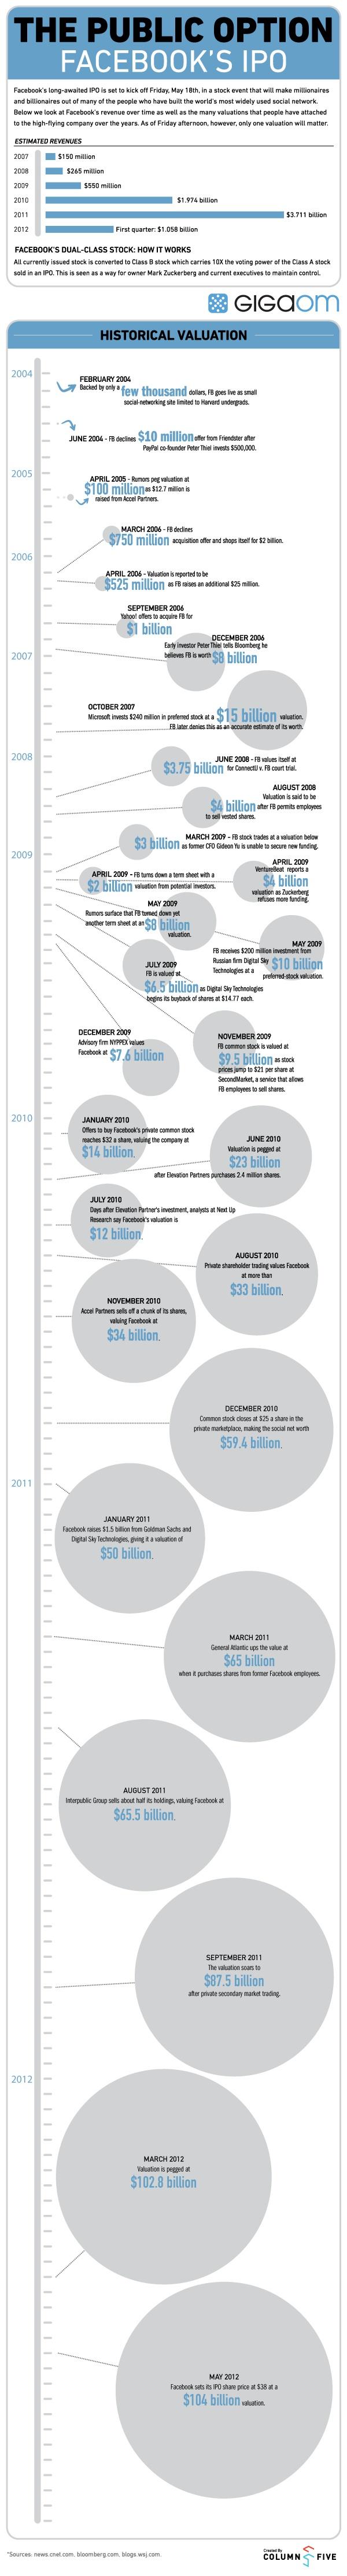 Facebook IPO Infographic 5/18/2012